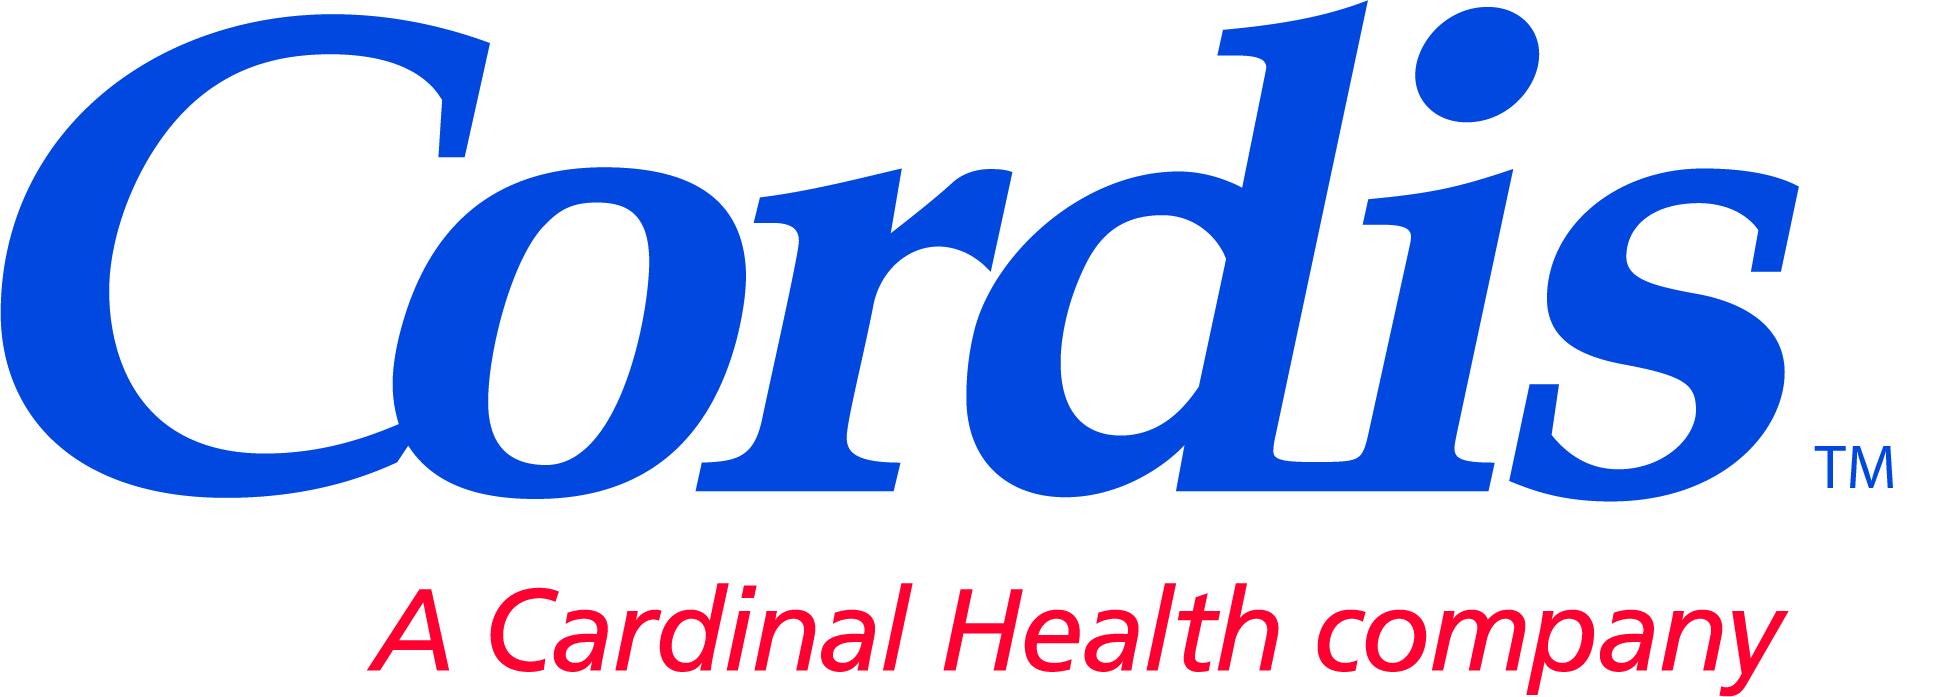 Cordis – A Cardinal Health Company